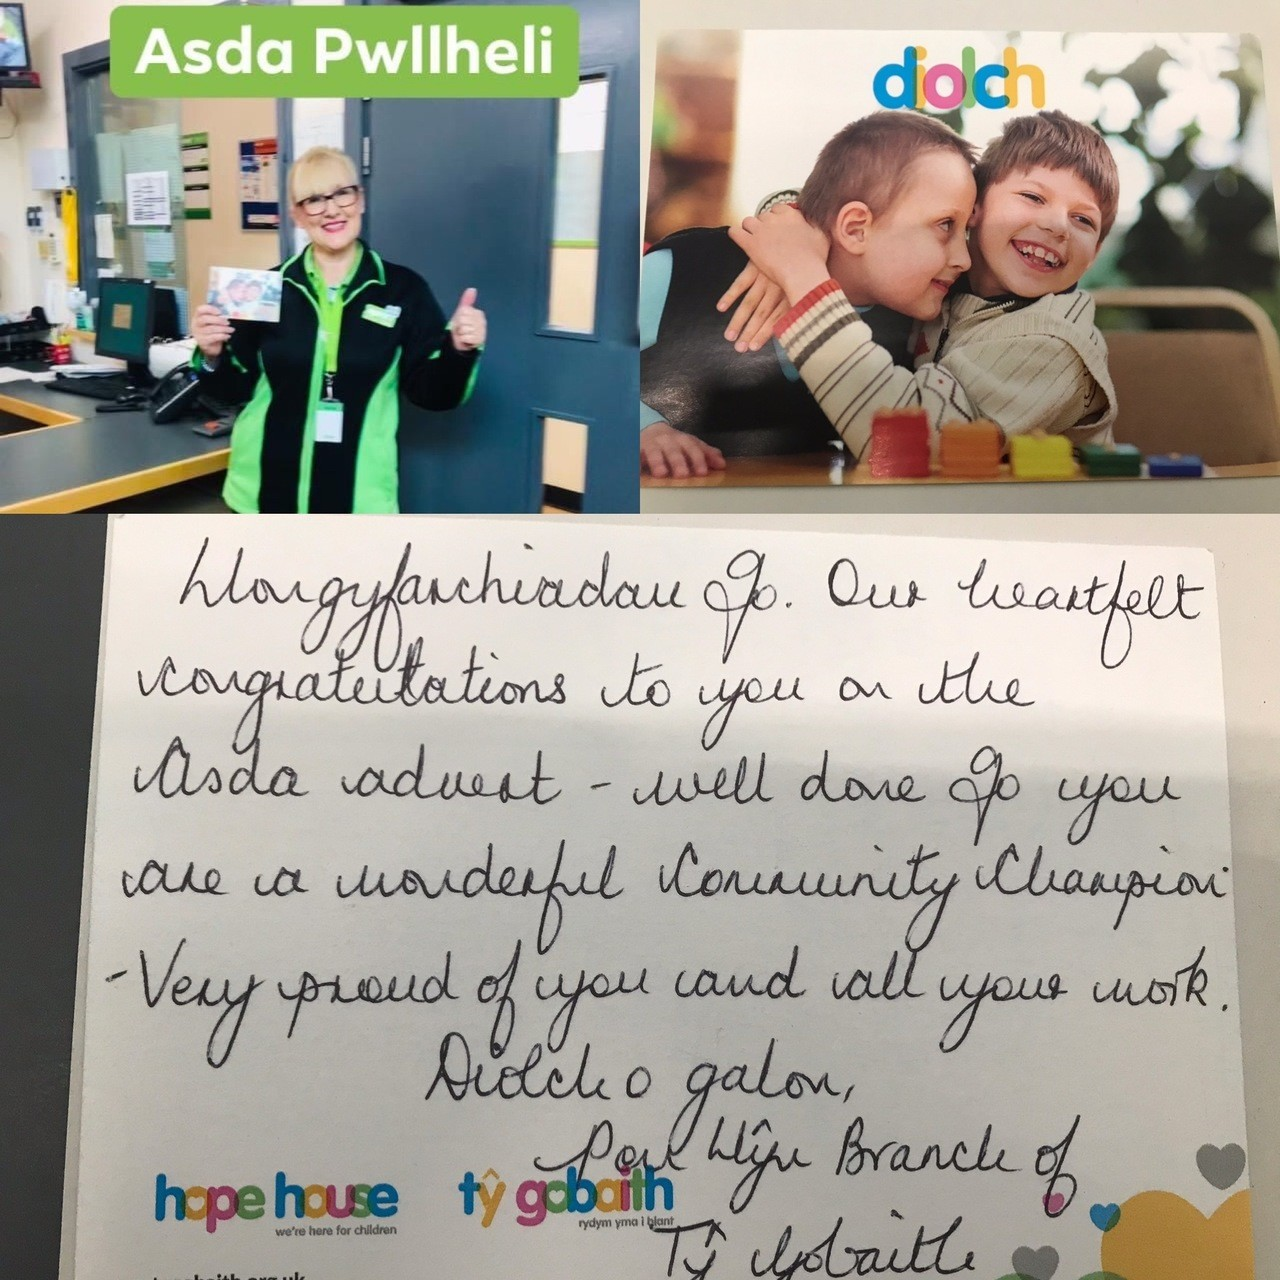 Lovely words from community group | Asda Pwllheli